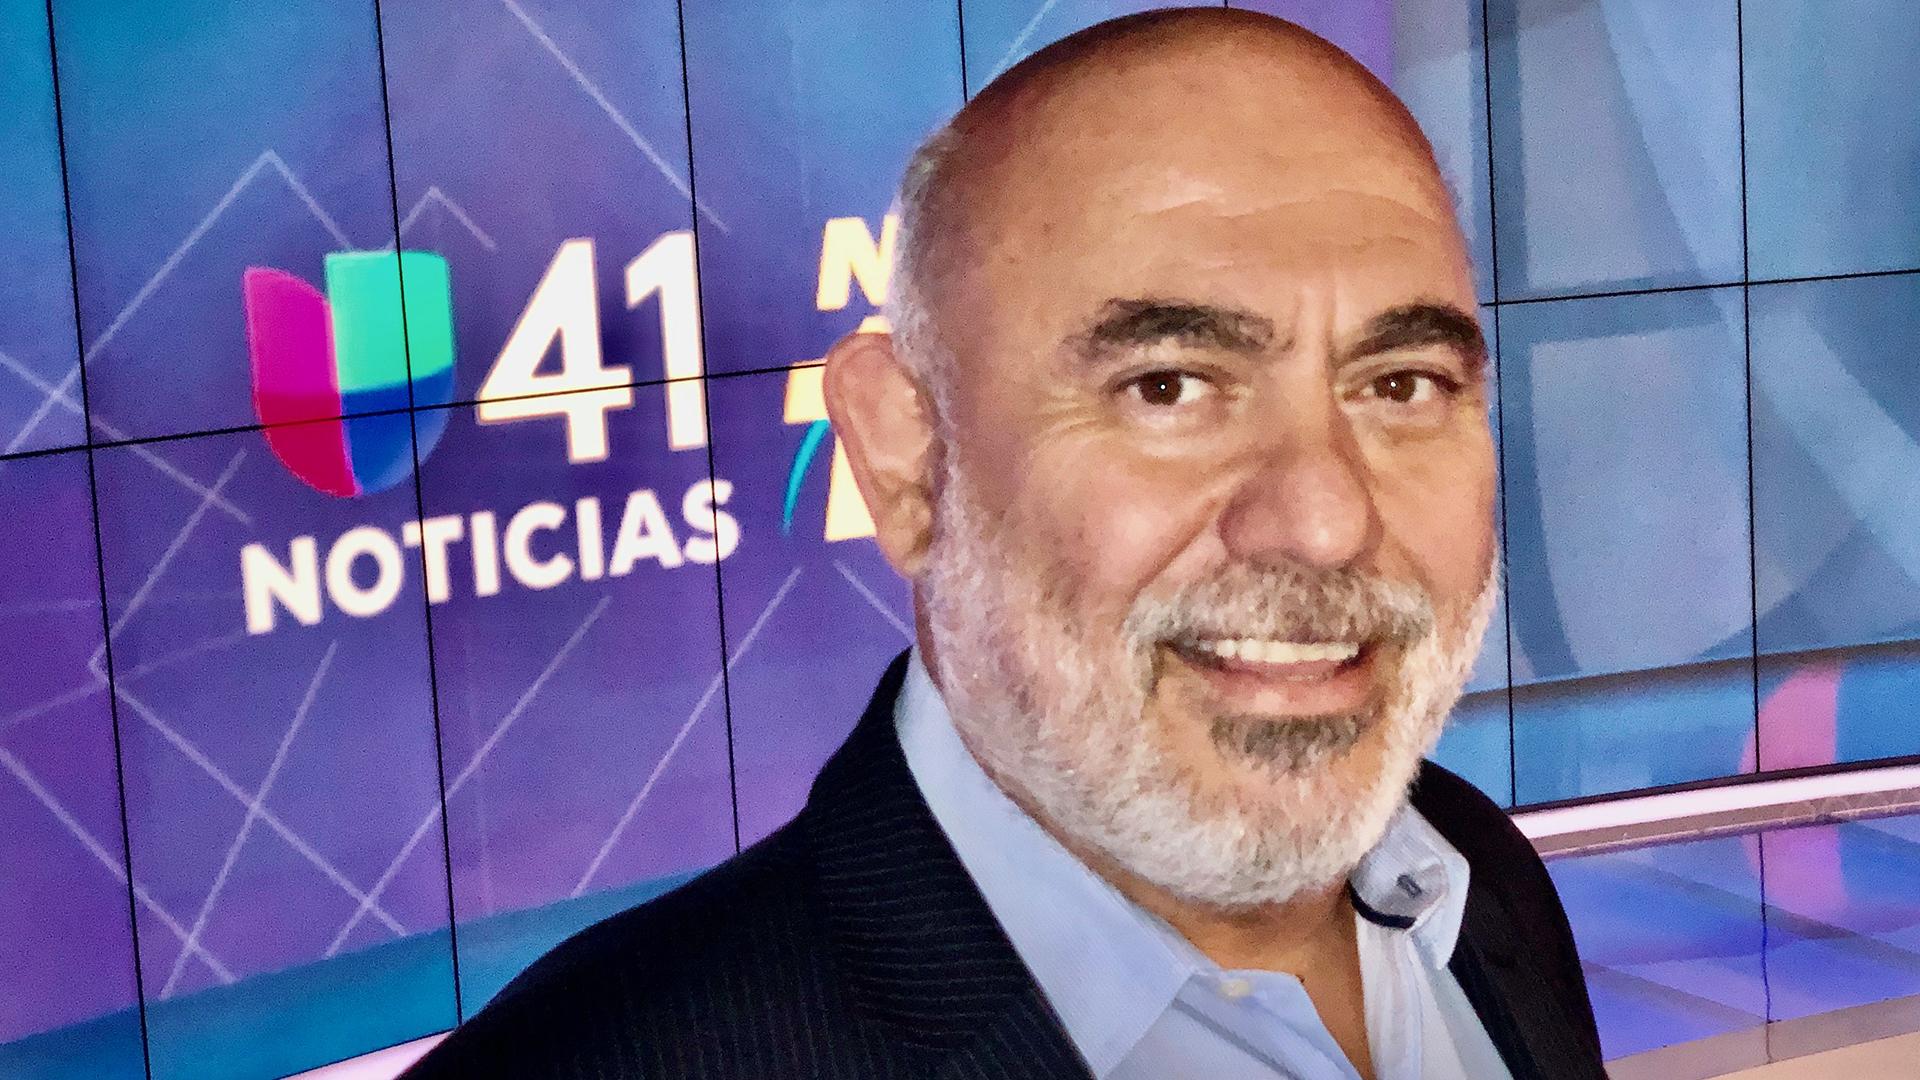 Man's face over Univision logo